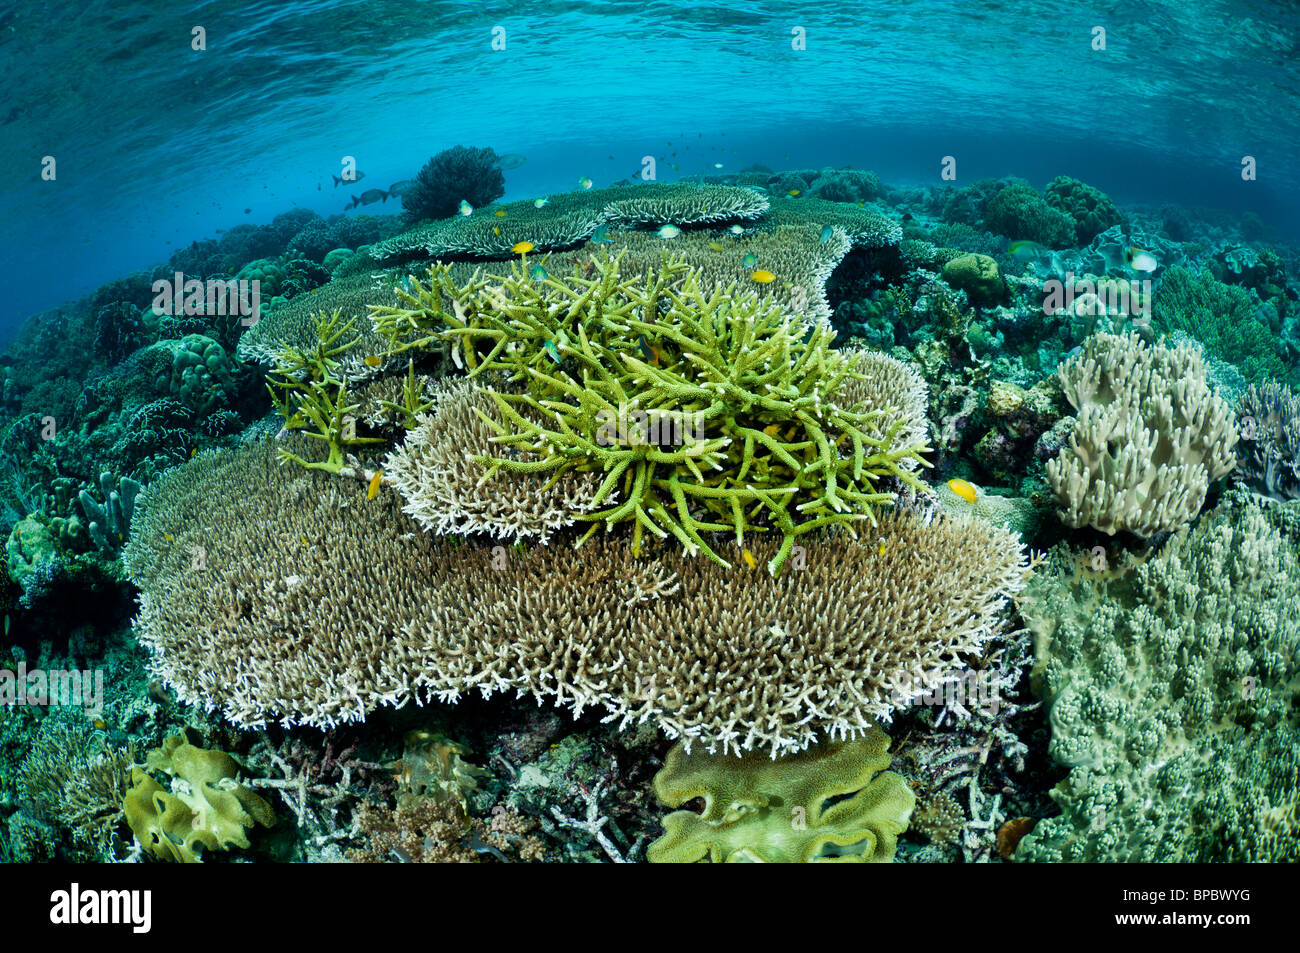 Healthy coral reef, Misool, Raja Ampat, West Papua, Indonesia. - Stock Image